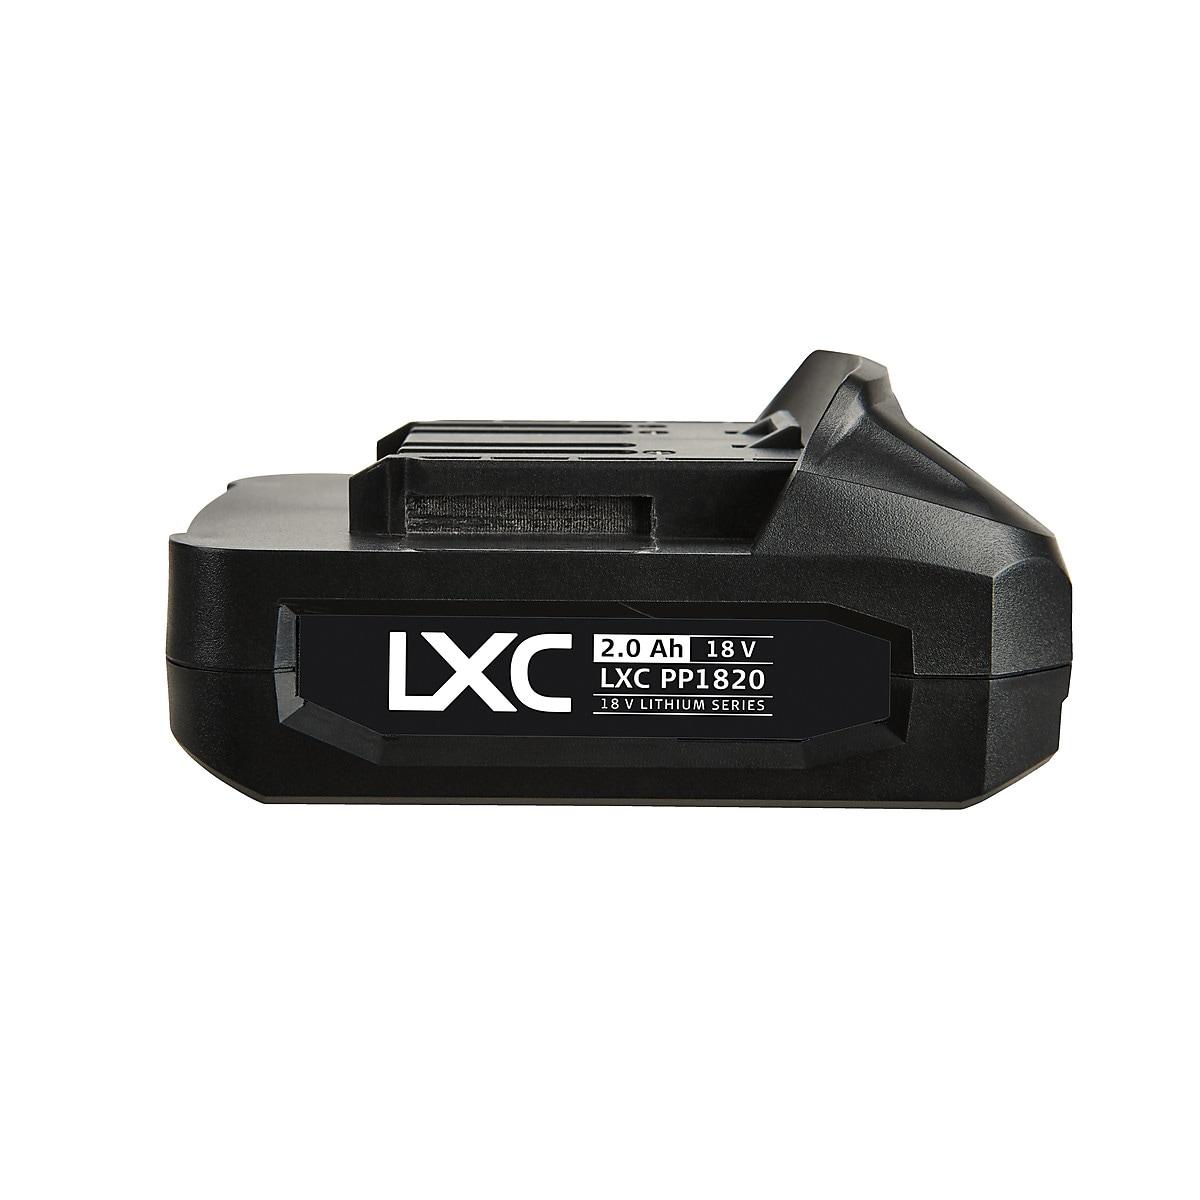 Akku Cocraft LXC PP1820